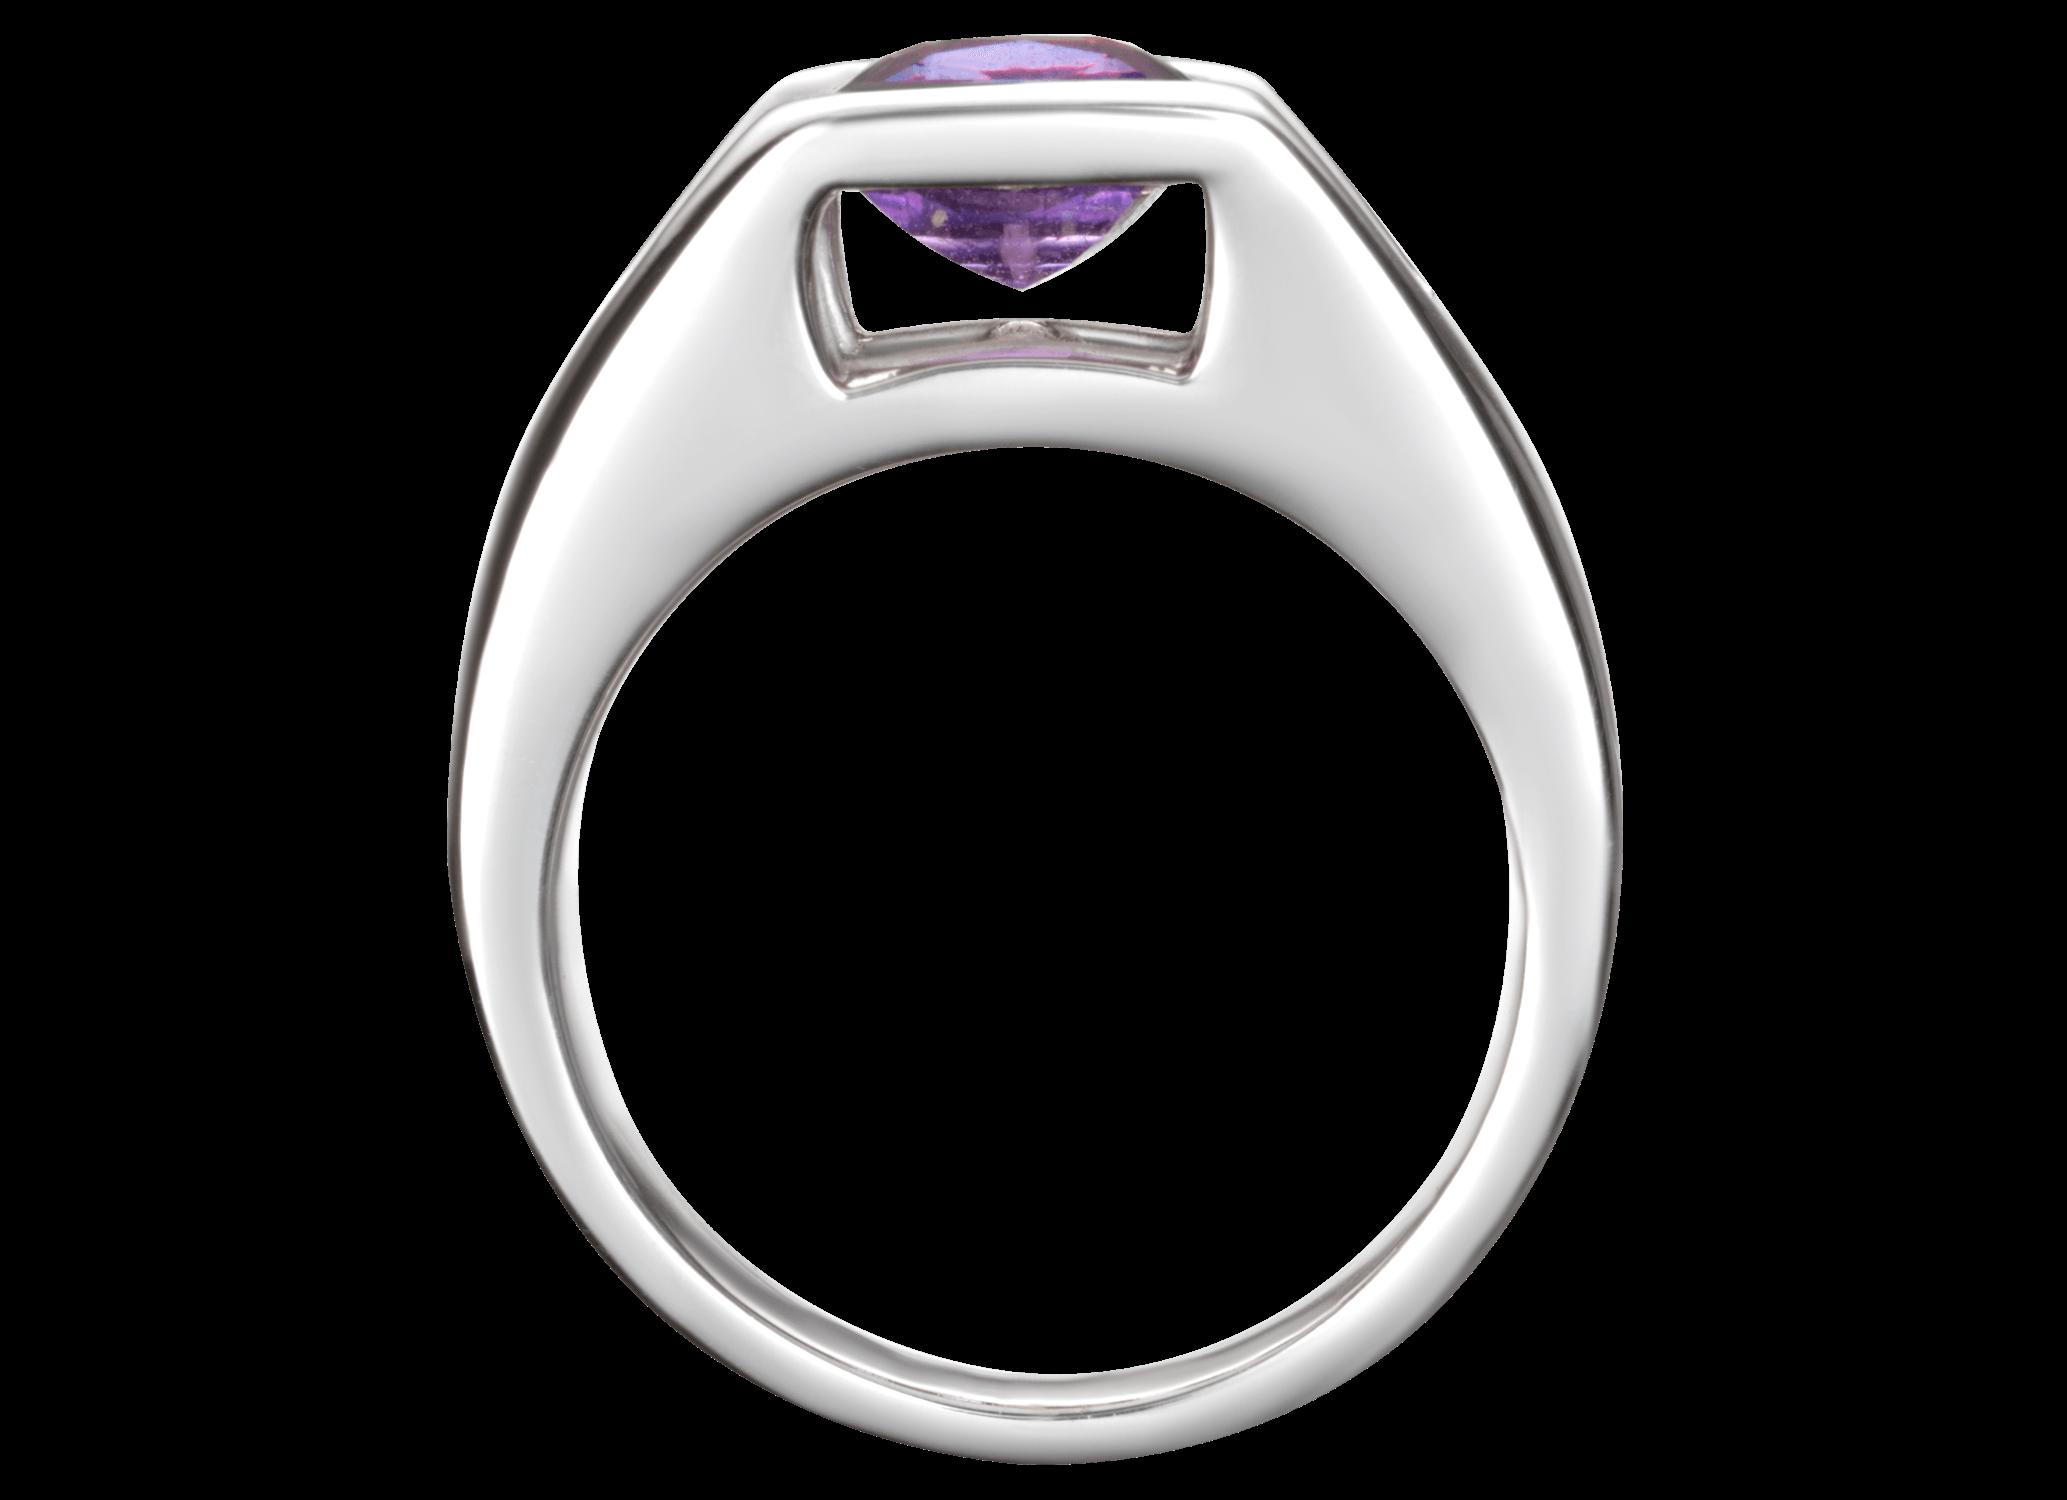 Bague Béa or blanc saphir violet coussin 2,37 carats PNG web.png